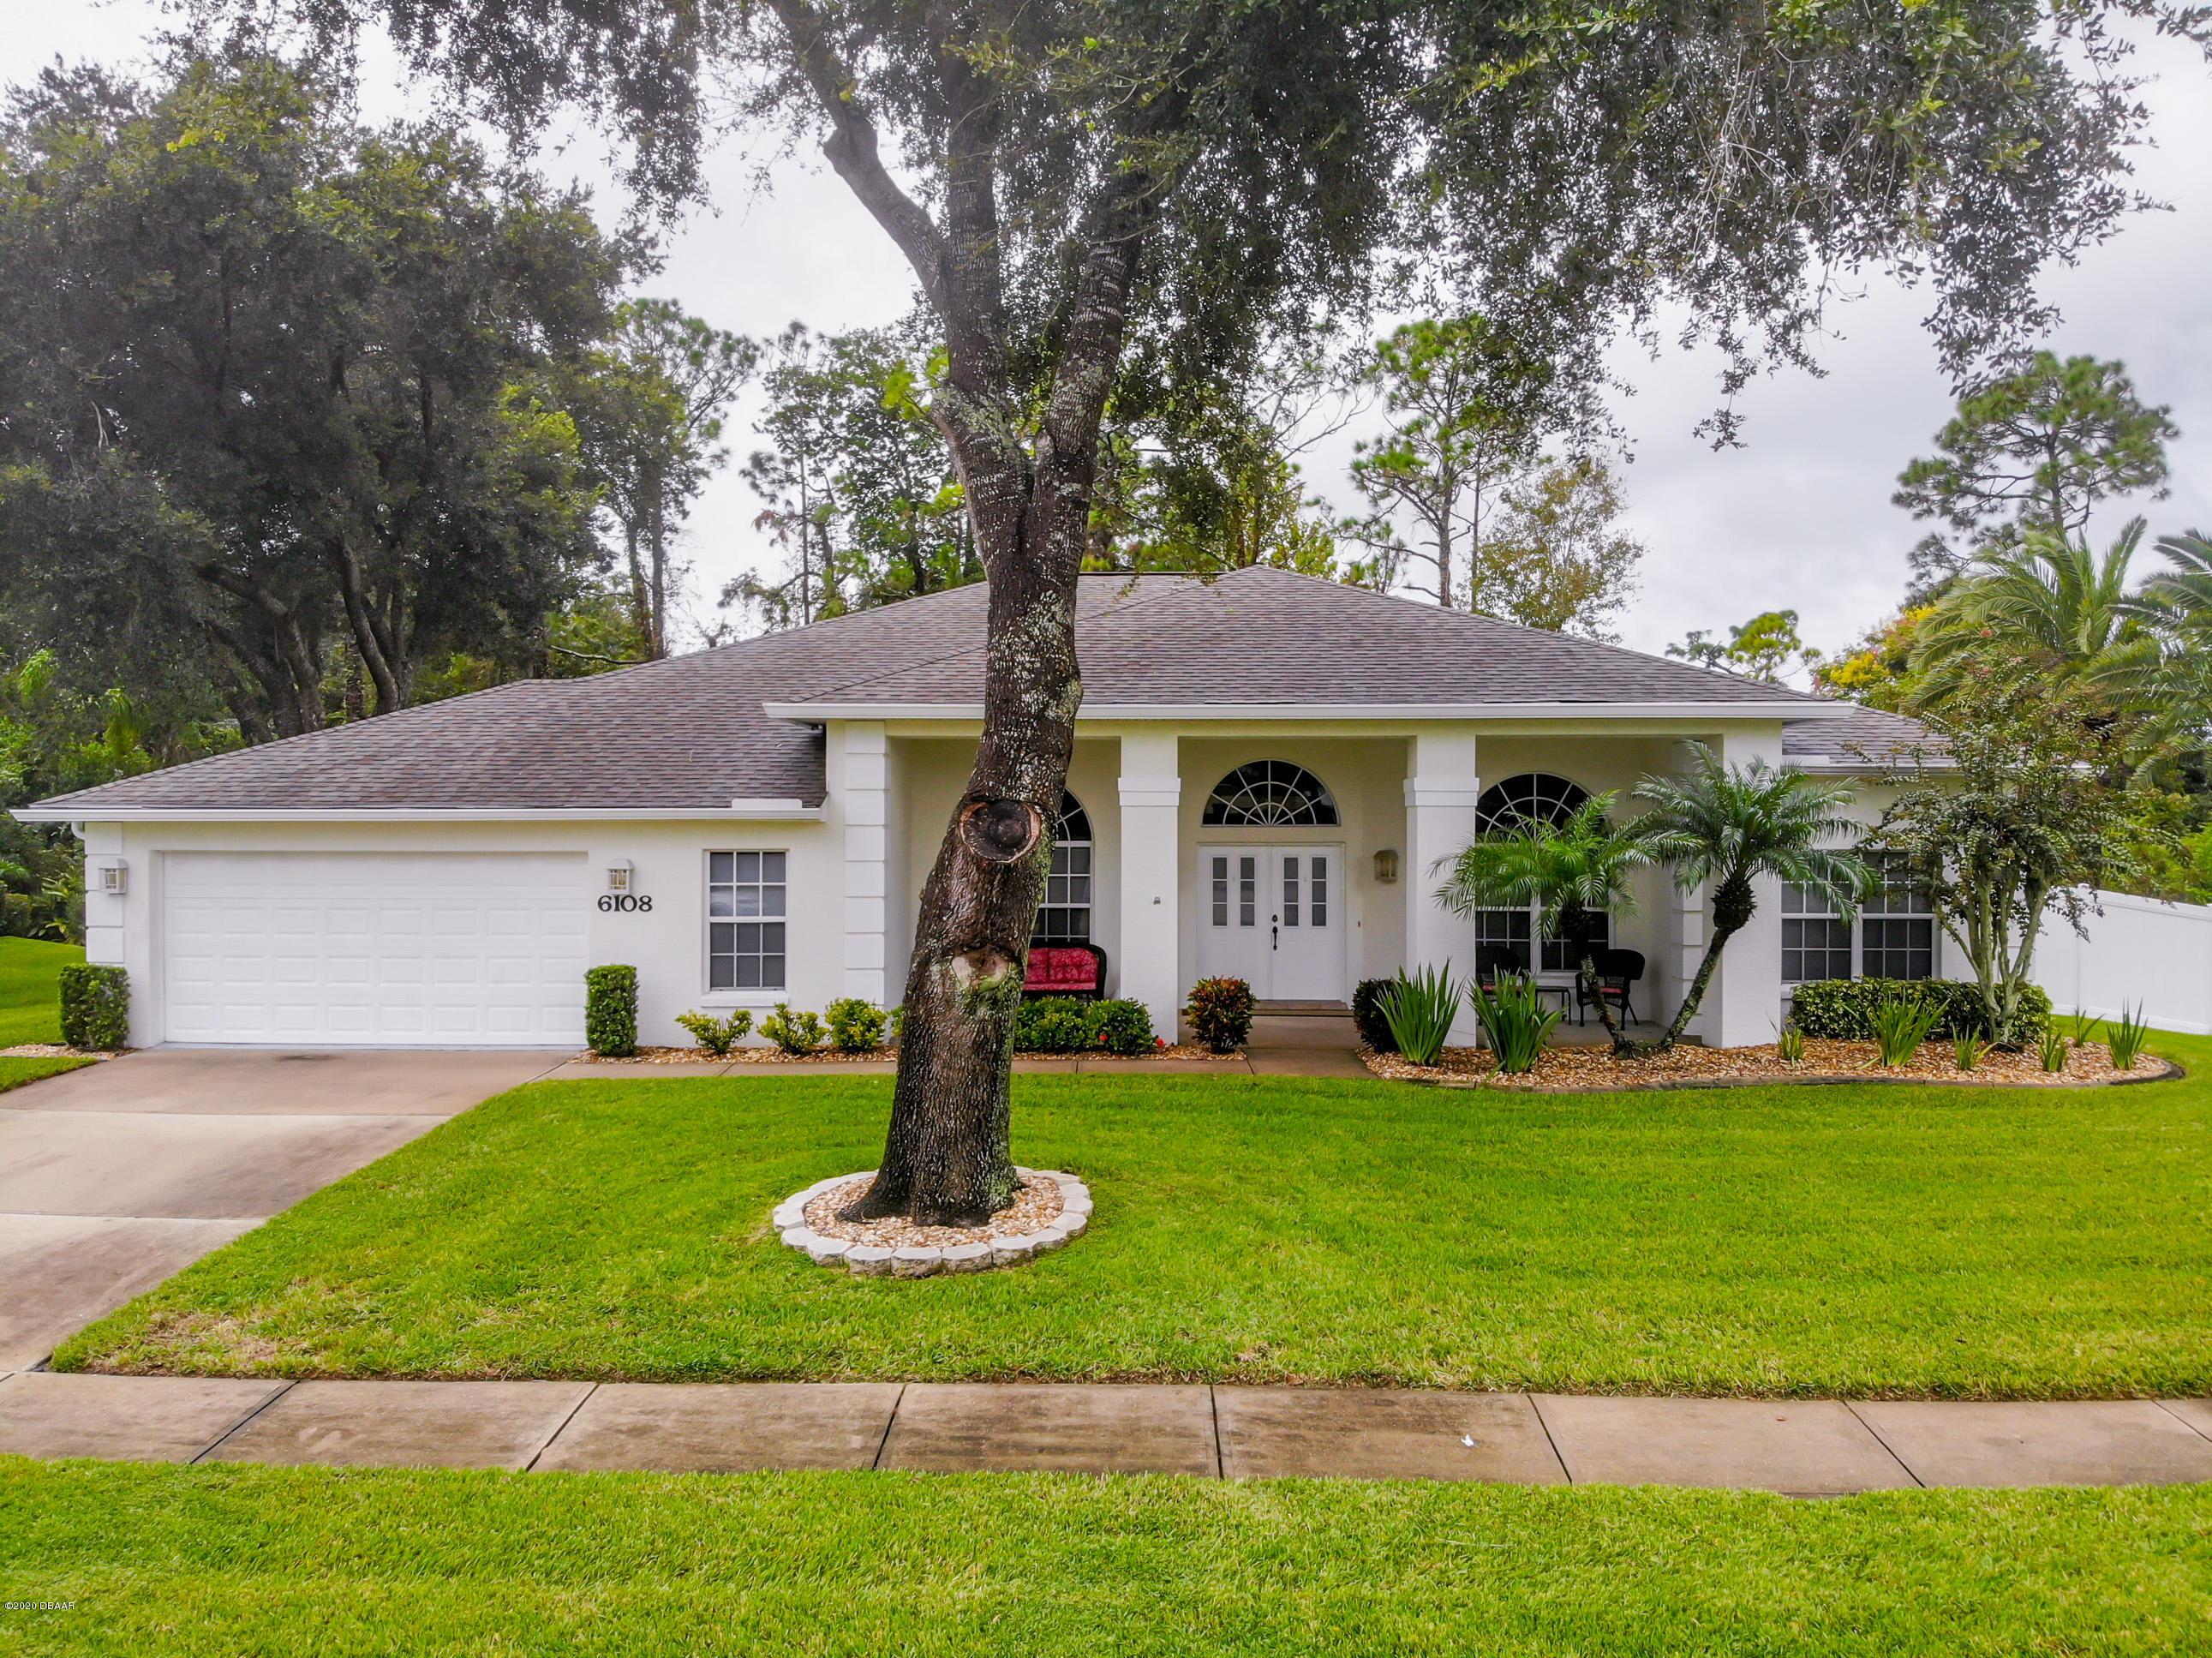 Photo of 6108 Pheasant Ridge Drive, Port Orange, FL 32128